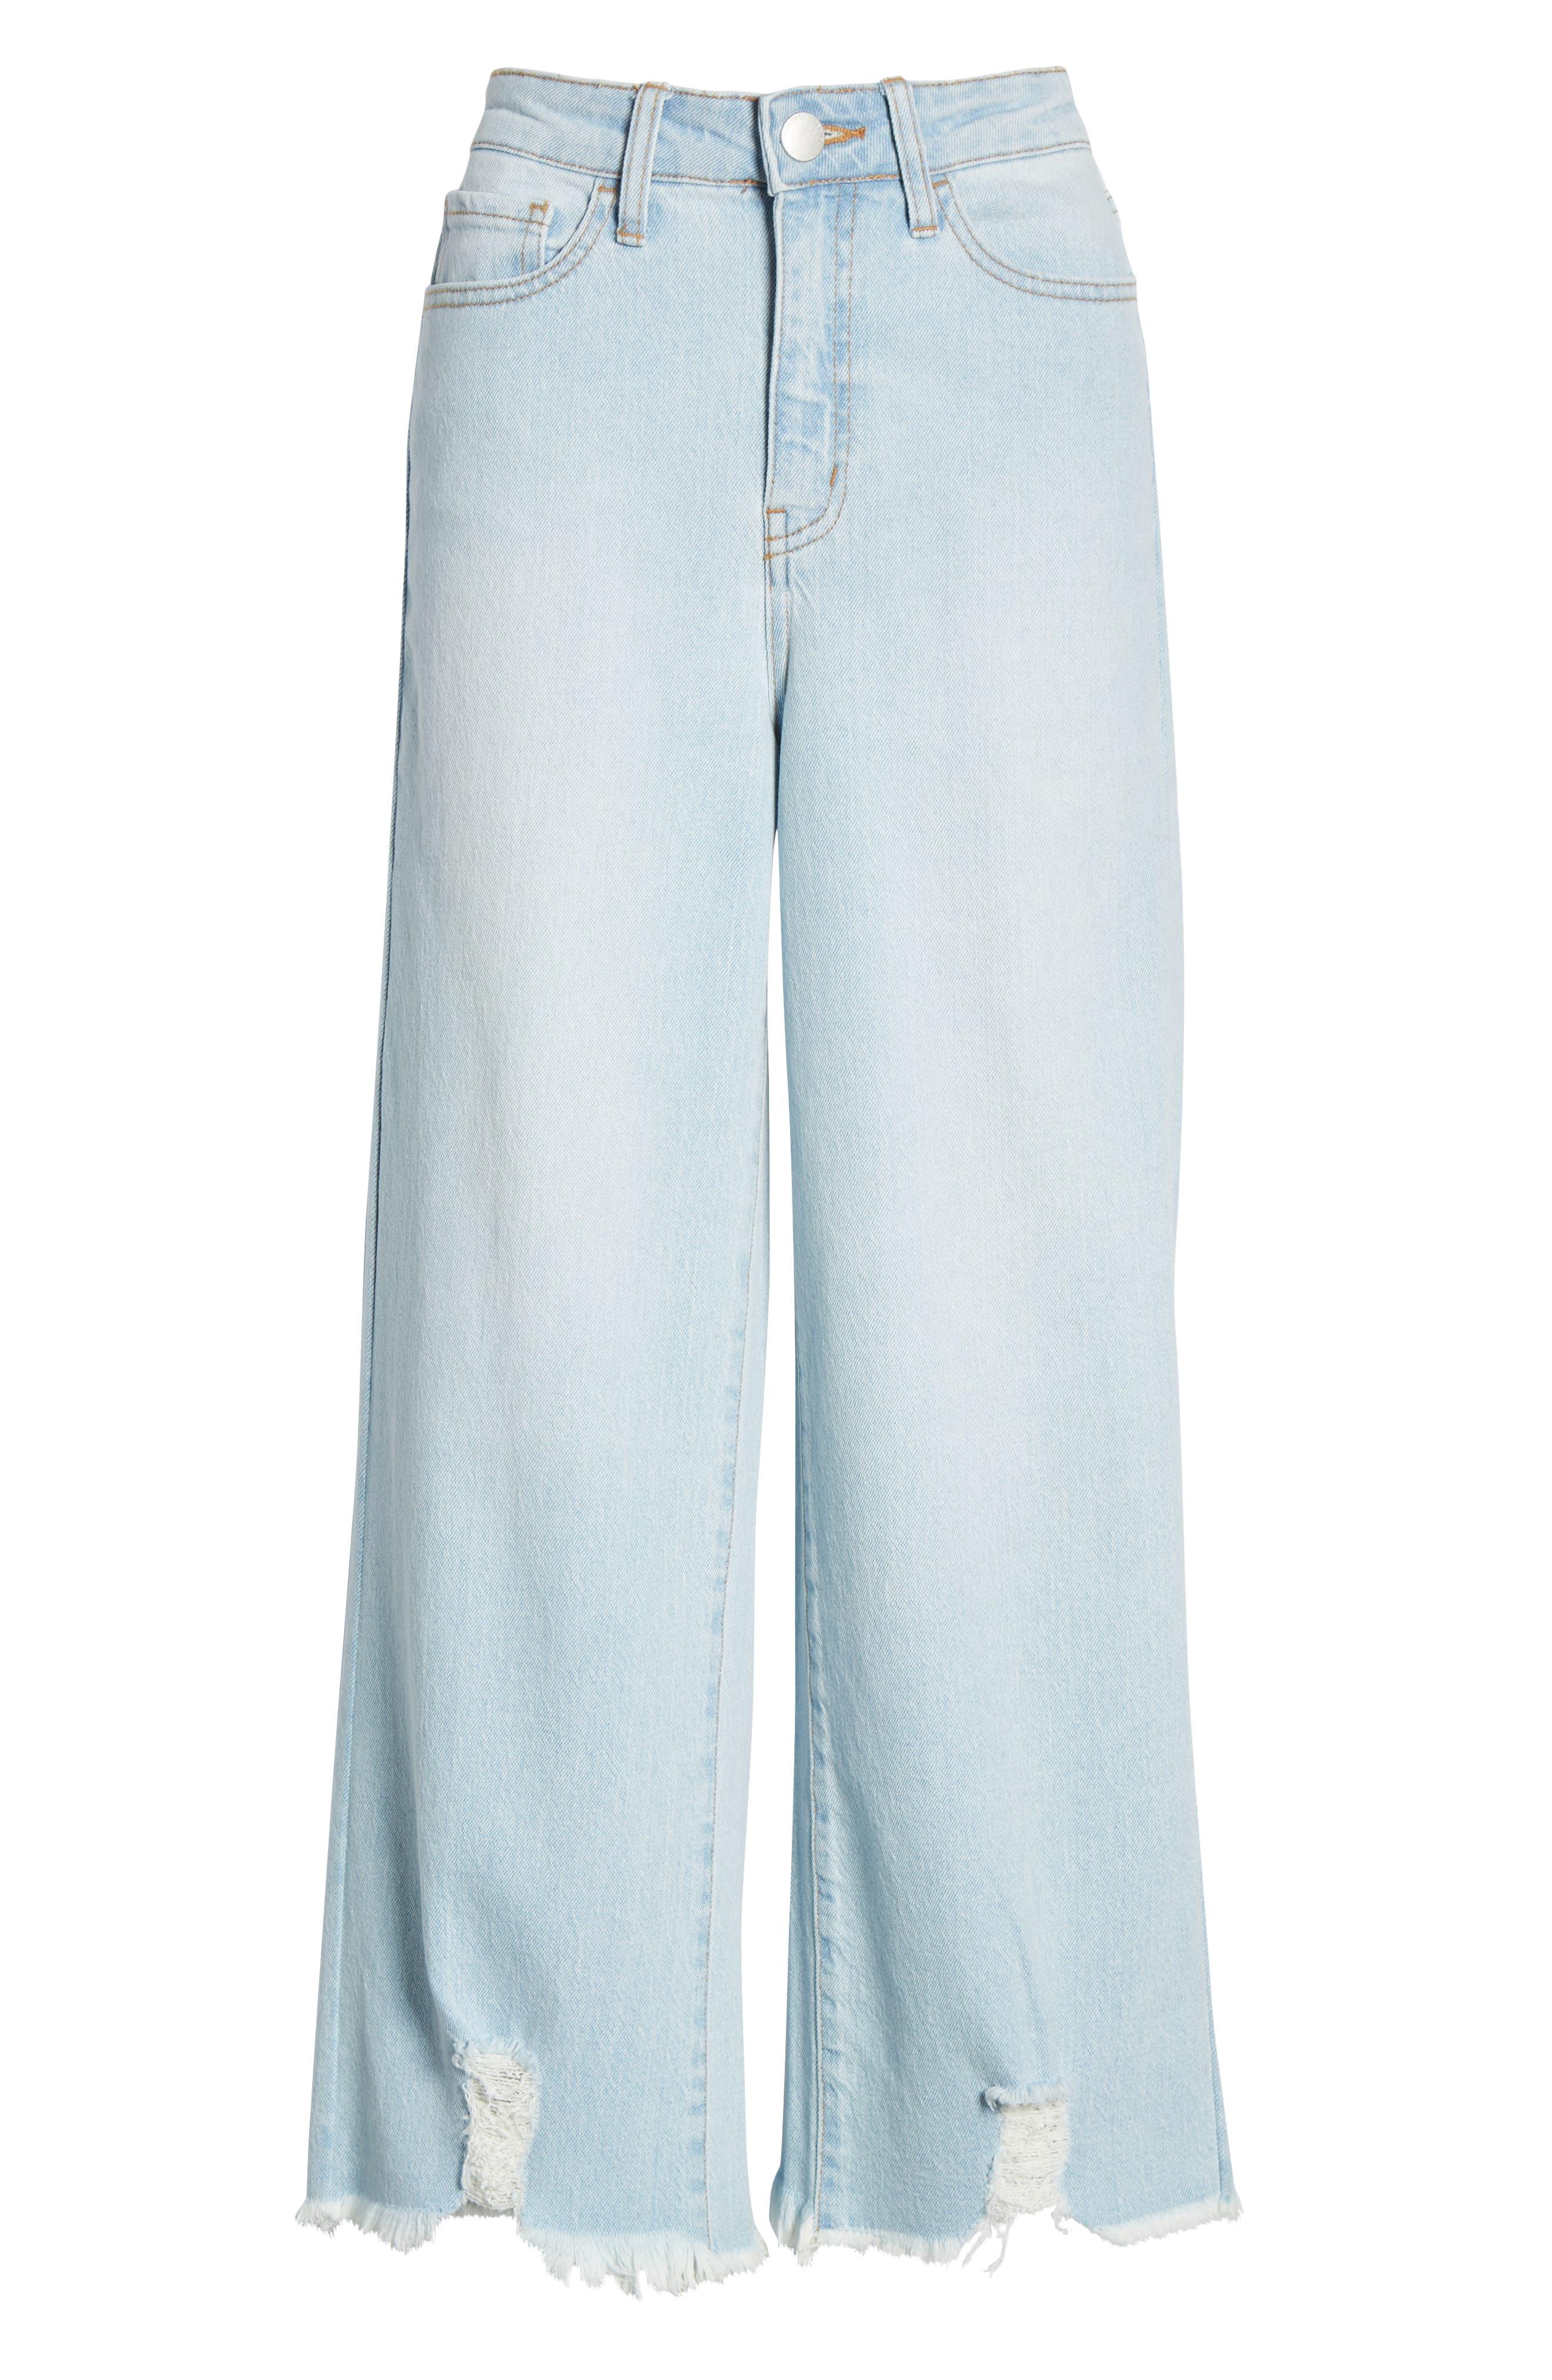 PROSPERITY DENIM, Fray Hem Wide Leg Crop Jeans, Alternate thumbnail 7, color, LIGHT WASH